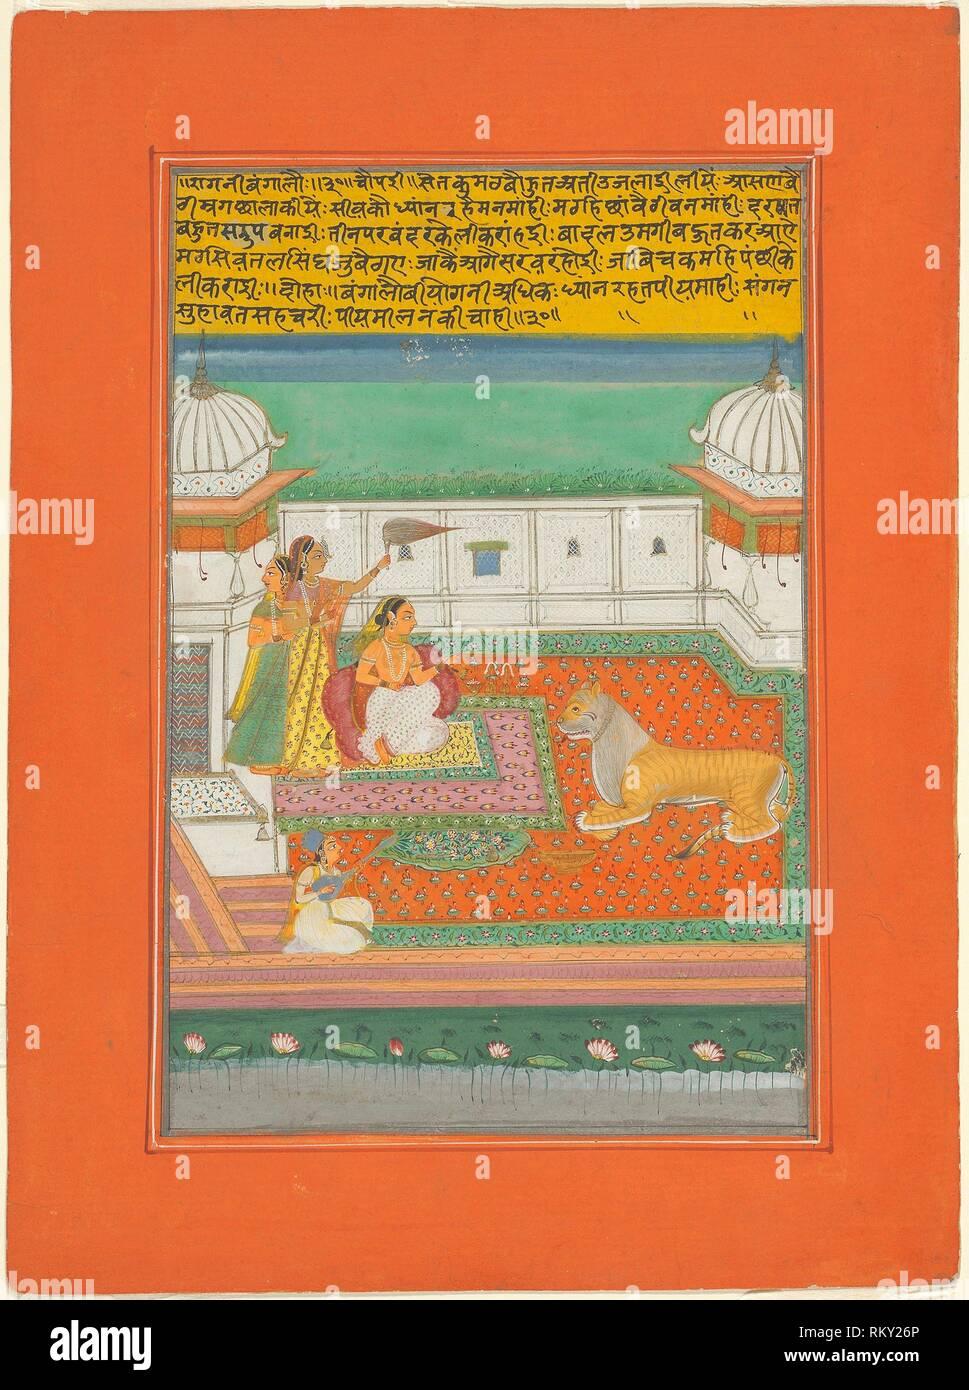 Ragini Bangali, Page from a Jaipur Ragamala Set - 1750/70 - India Rajasthan, Jaipur - Origin: Rajasthan, Date: 1745–1770, Medium: Opaque watercolor - Stock Image